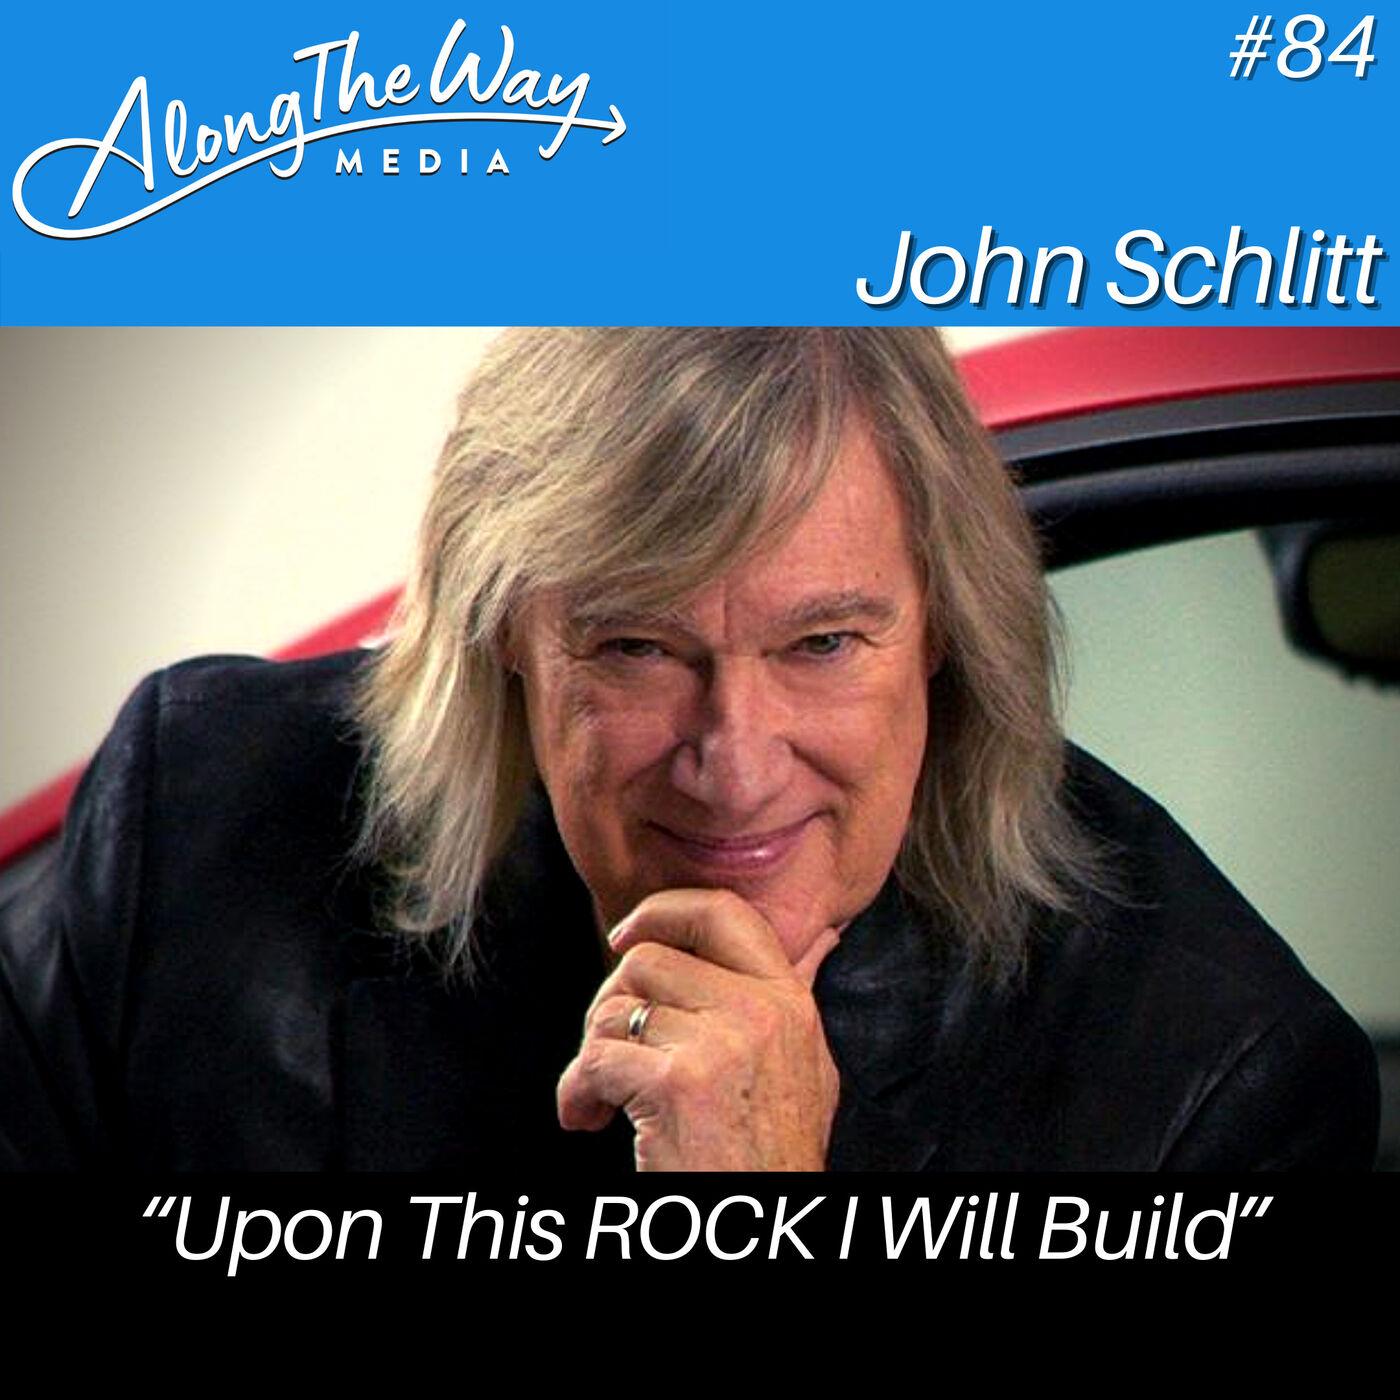 """Upon This ROCK I Will Build"" - John Schlitt AlongTheWay 84"